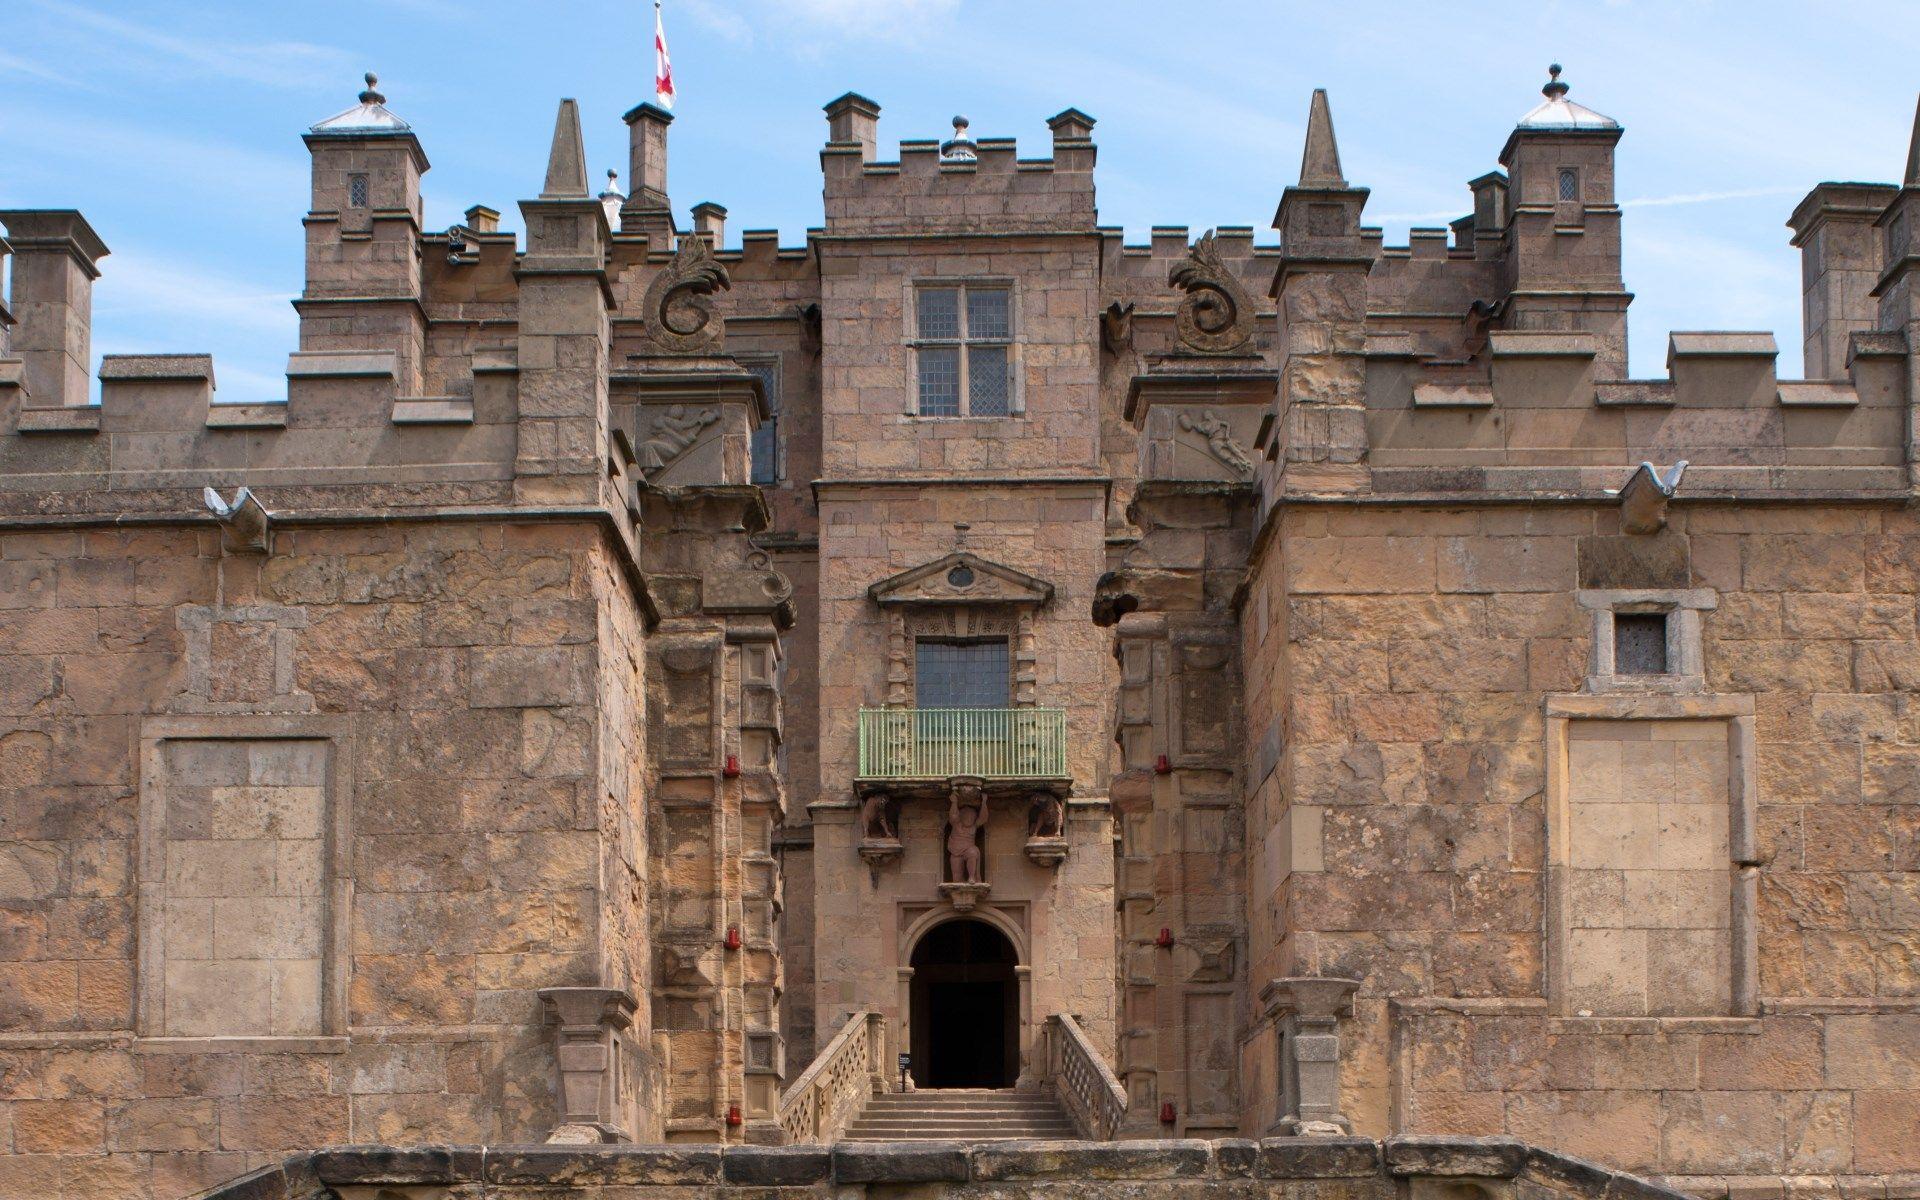 high resolution wallpapers widescreen bolsover castle